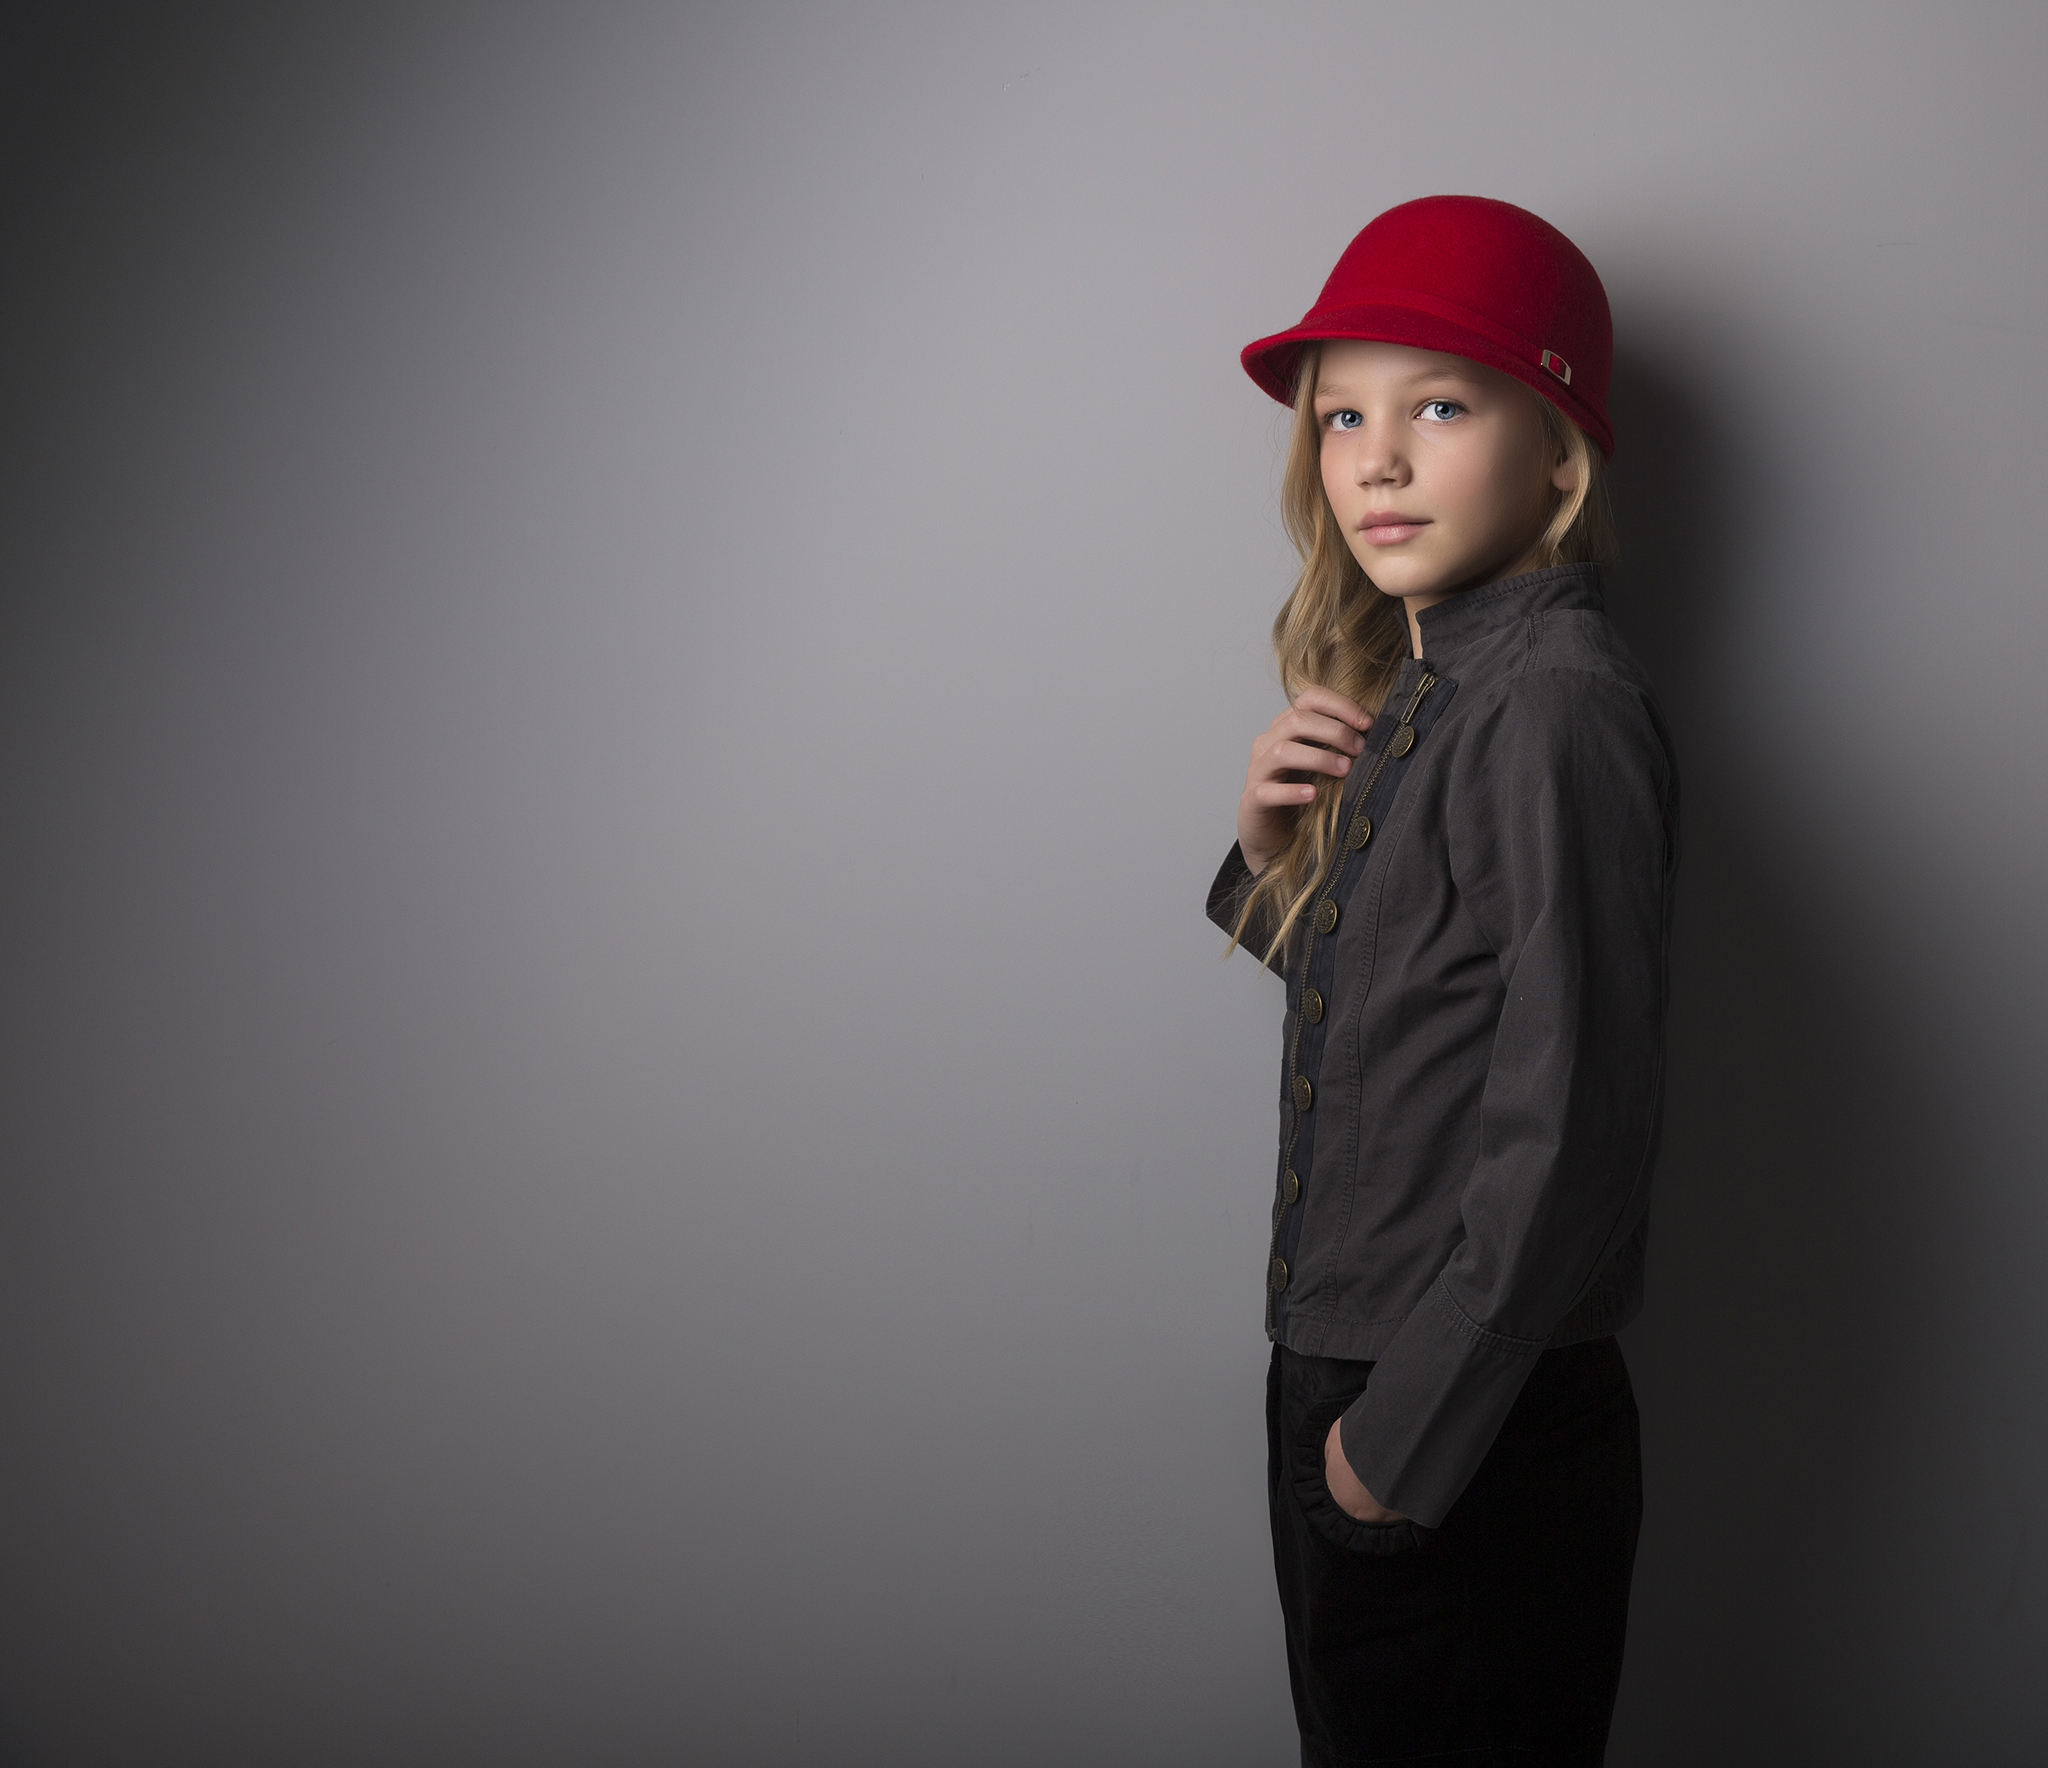 elizabethgphotography_kingslangley_hertfordshire_fineart_childrens_photography_81.jpg